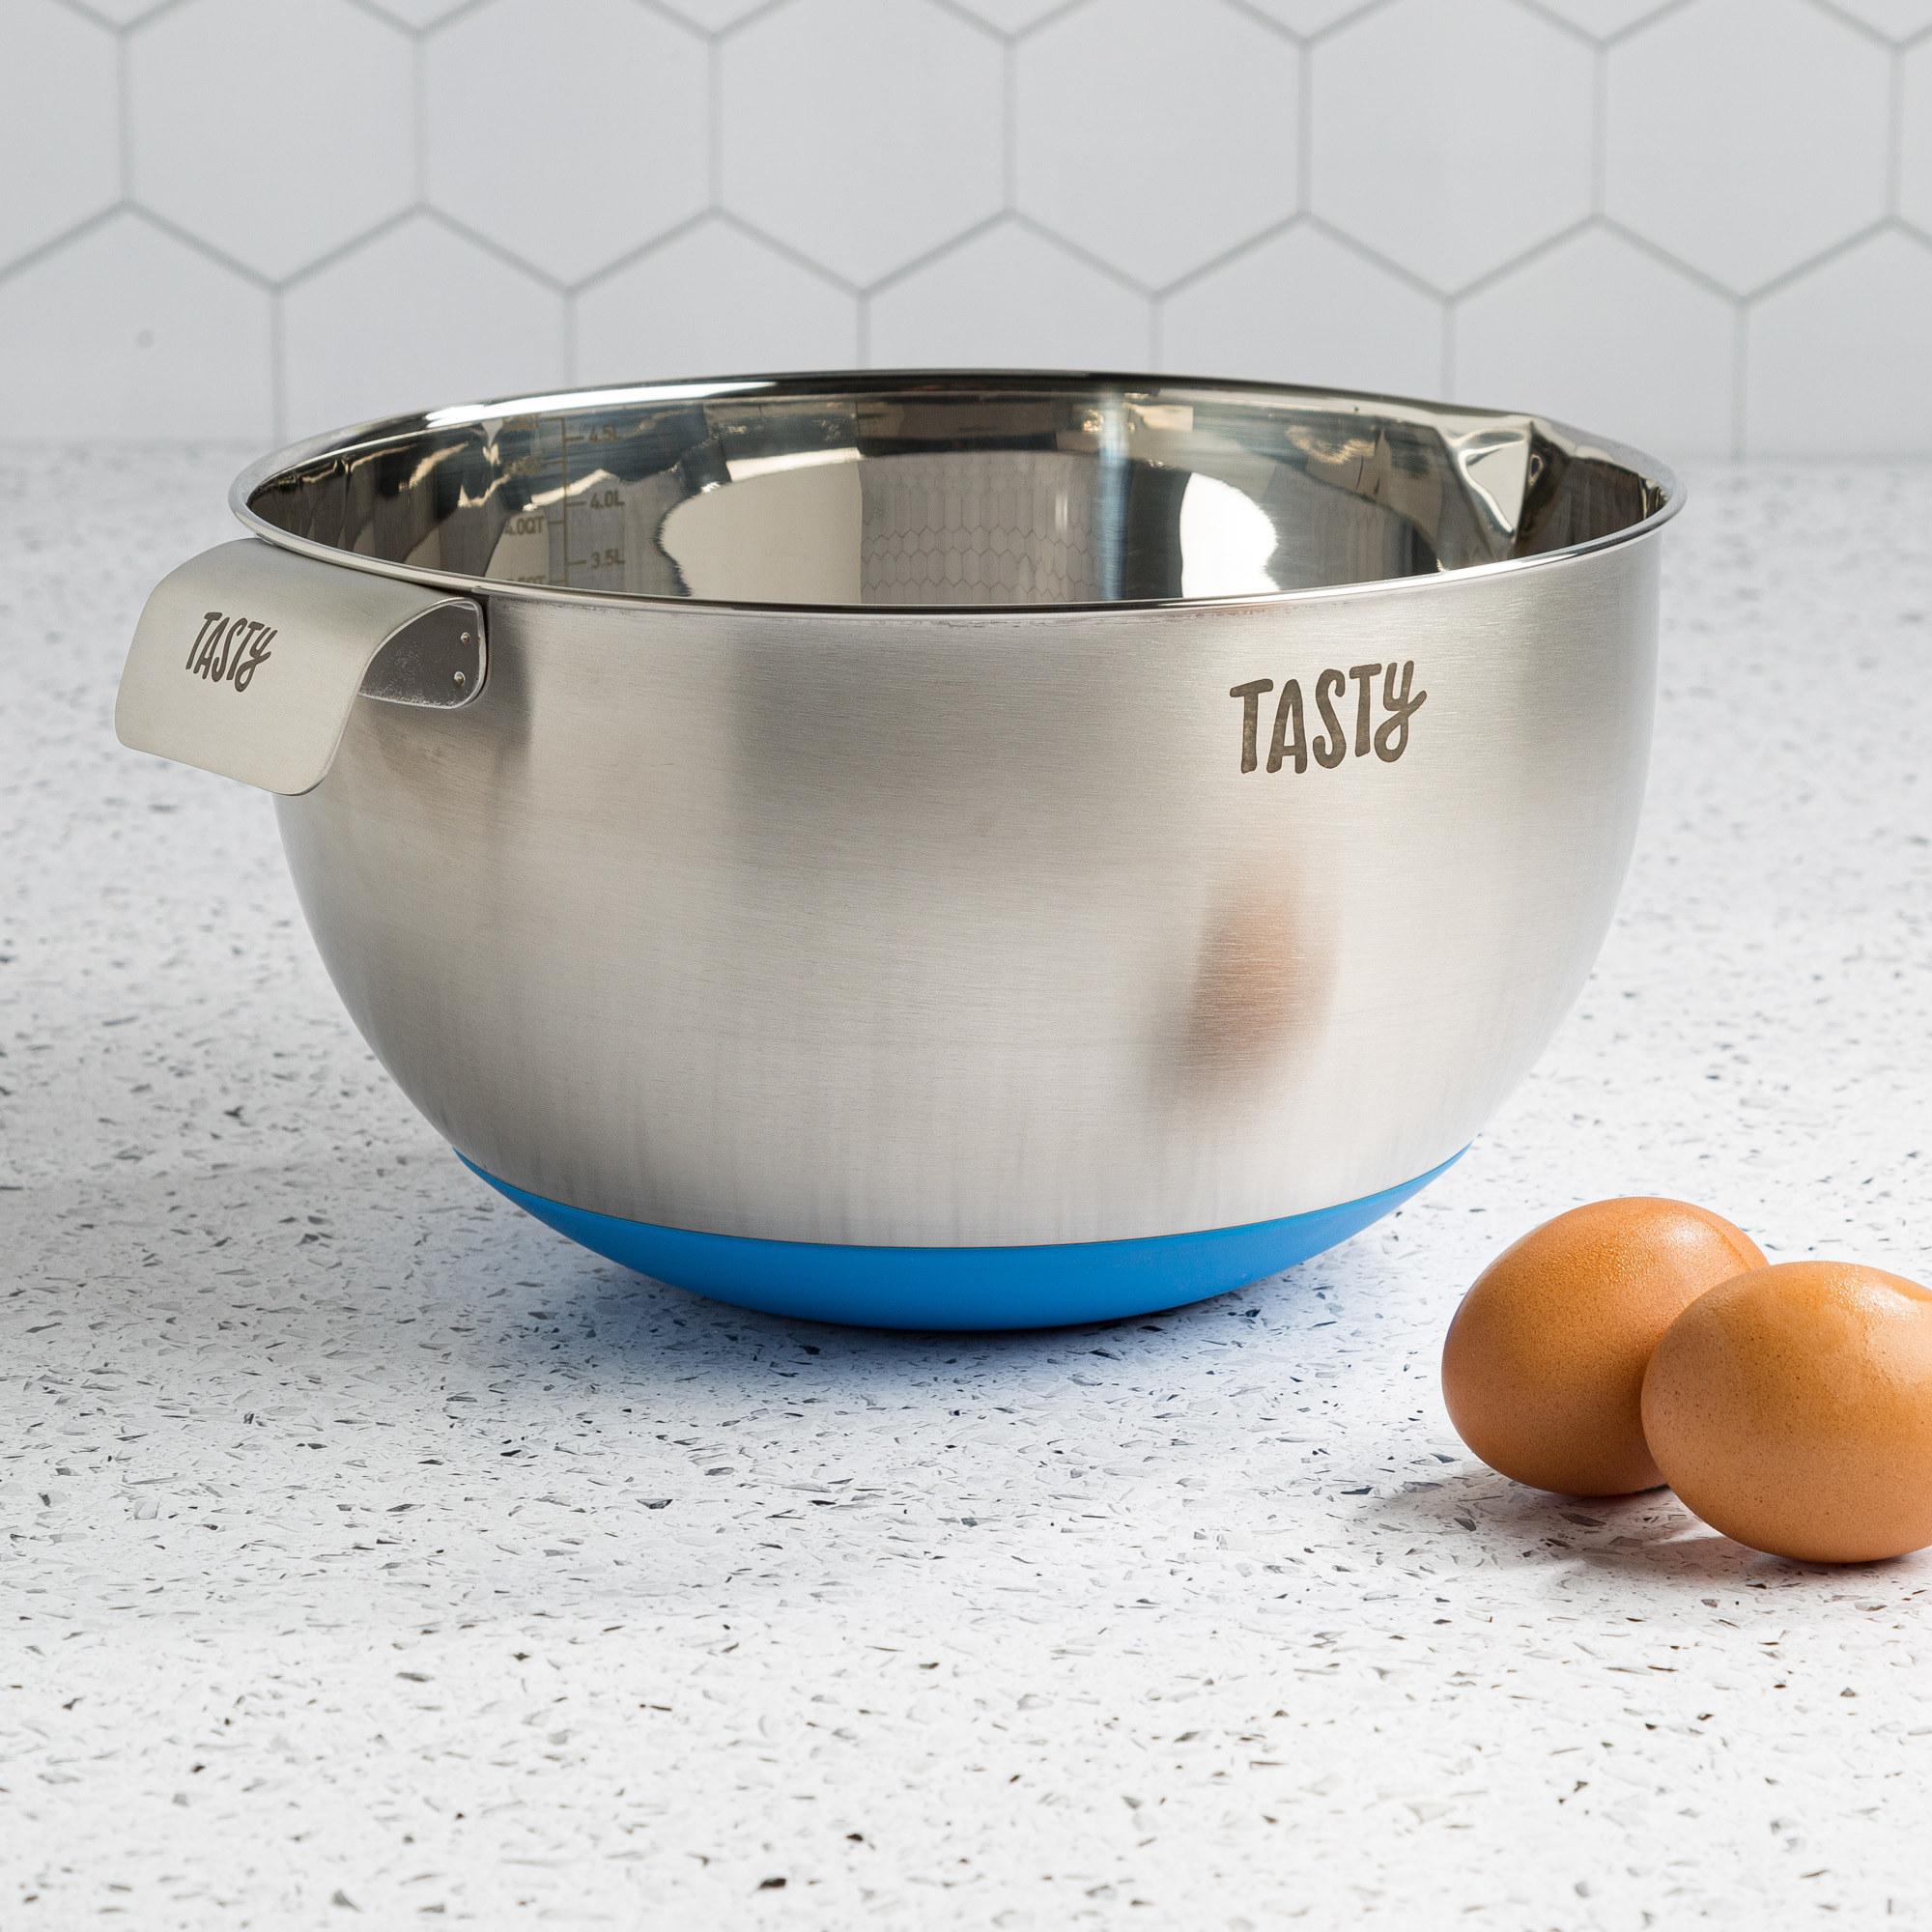 The mixing bowl displayed next to cooking ingredients